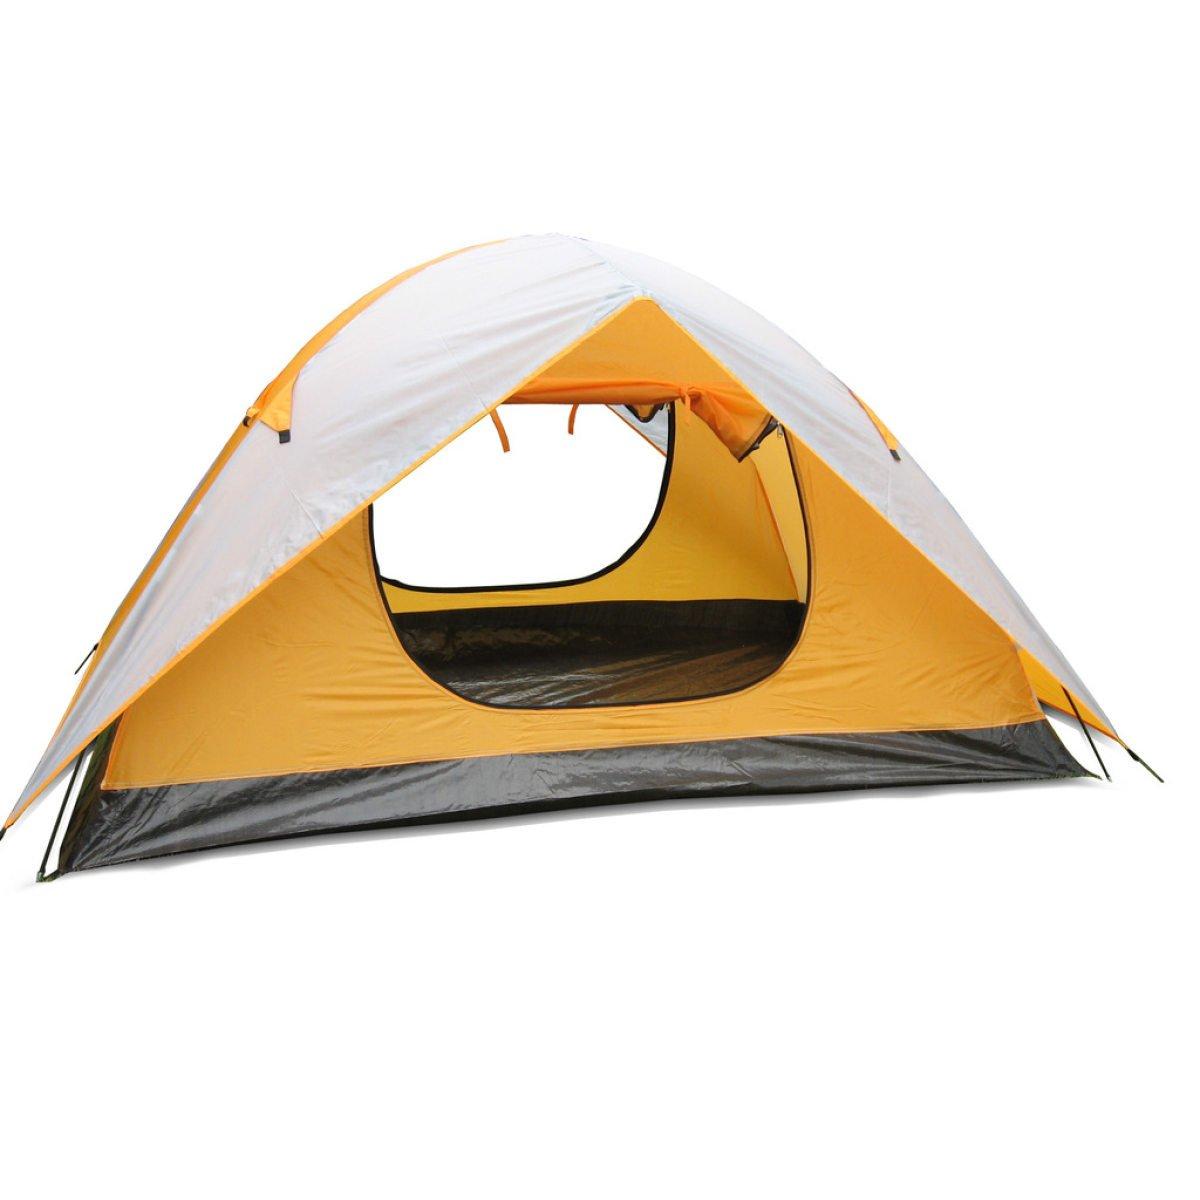 BFMEI Im Freien Camping Angeln Zelt Doppelzelt,200140110CM-Gelb